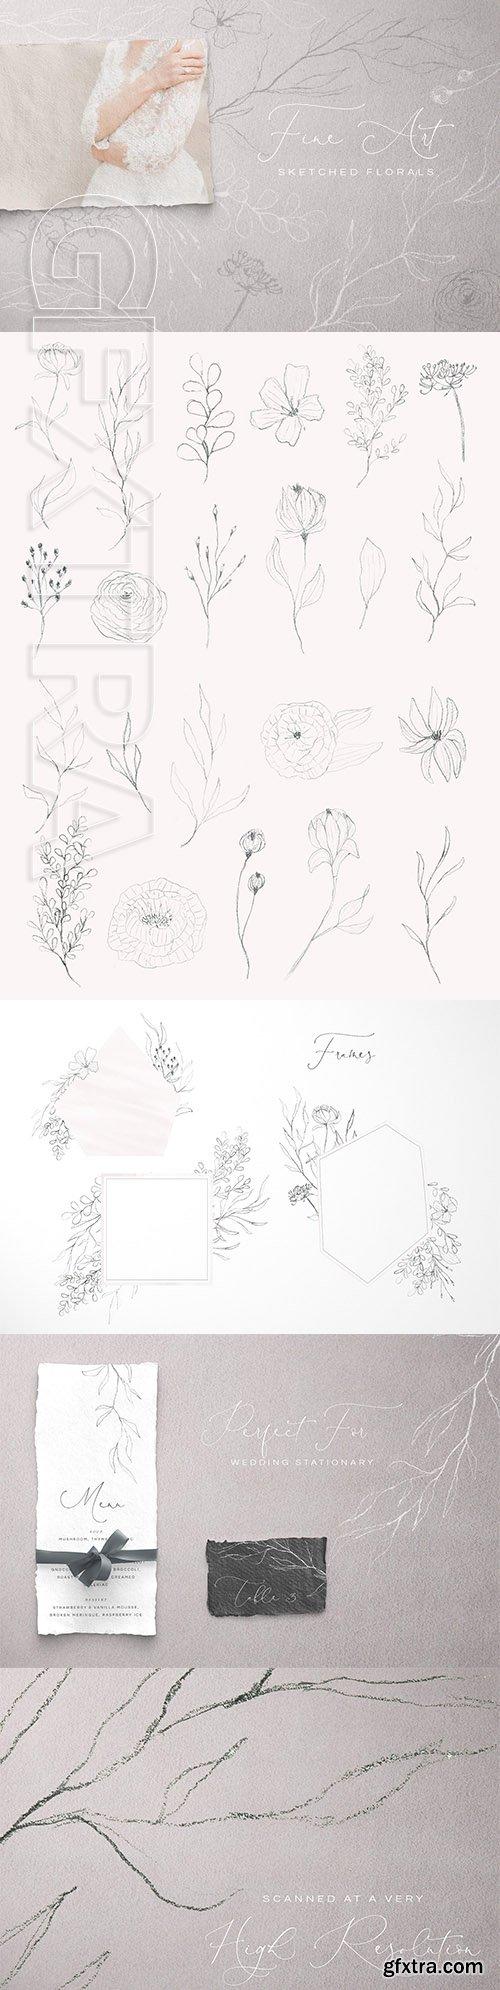 CreativeMarket - Fine Art Sketched Florals 3156472